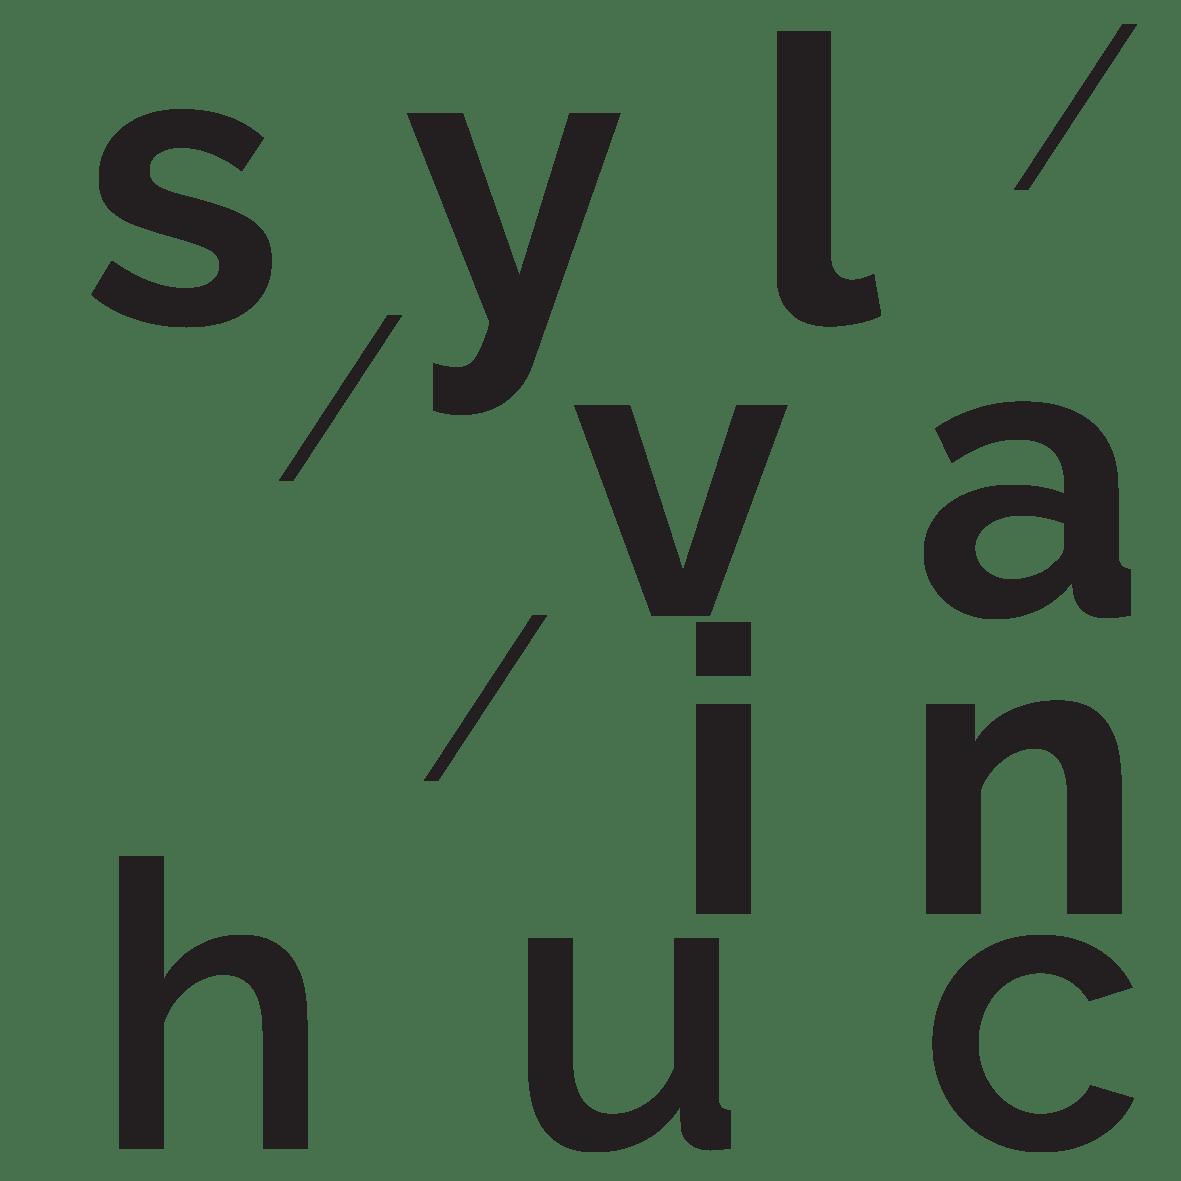 sylvain-huc-logo-noir-hd.png